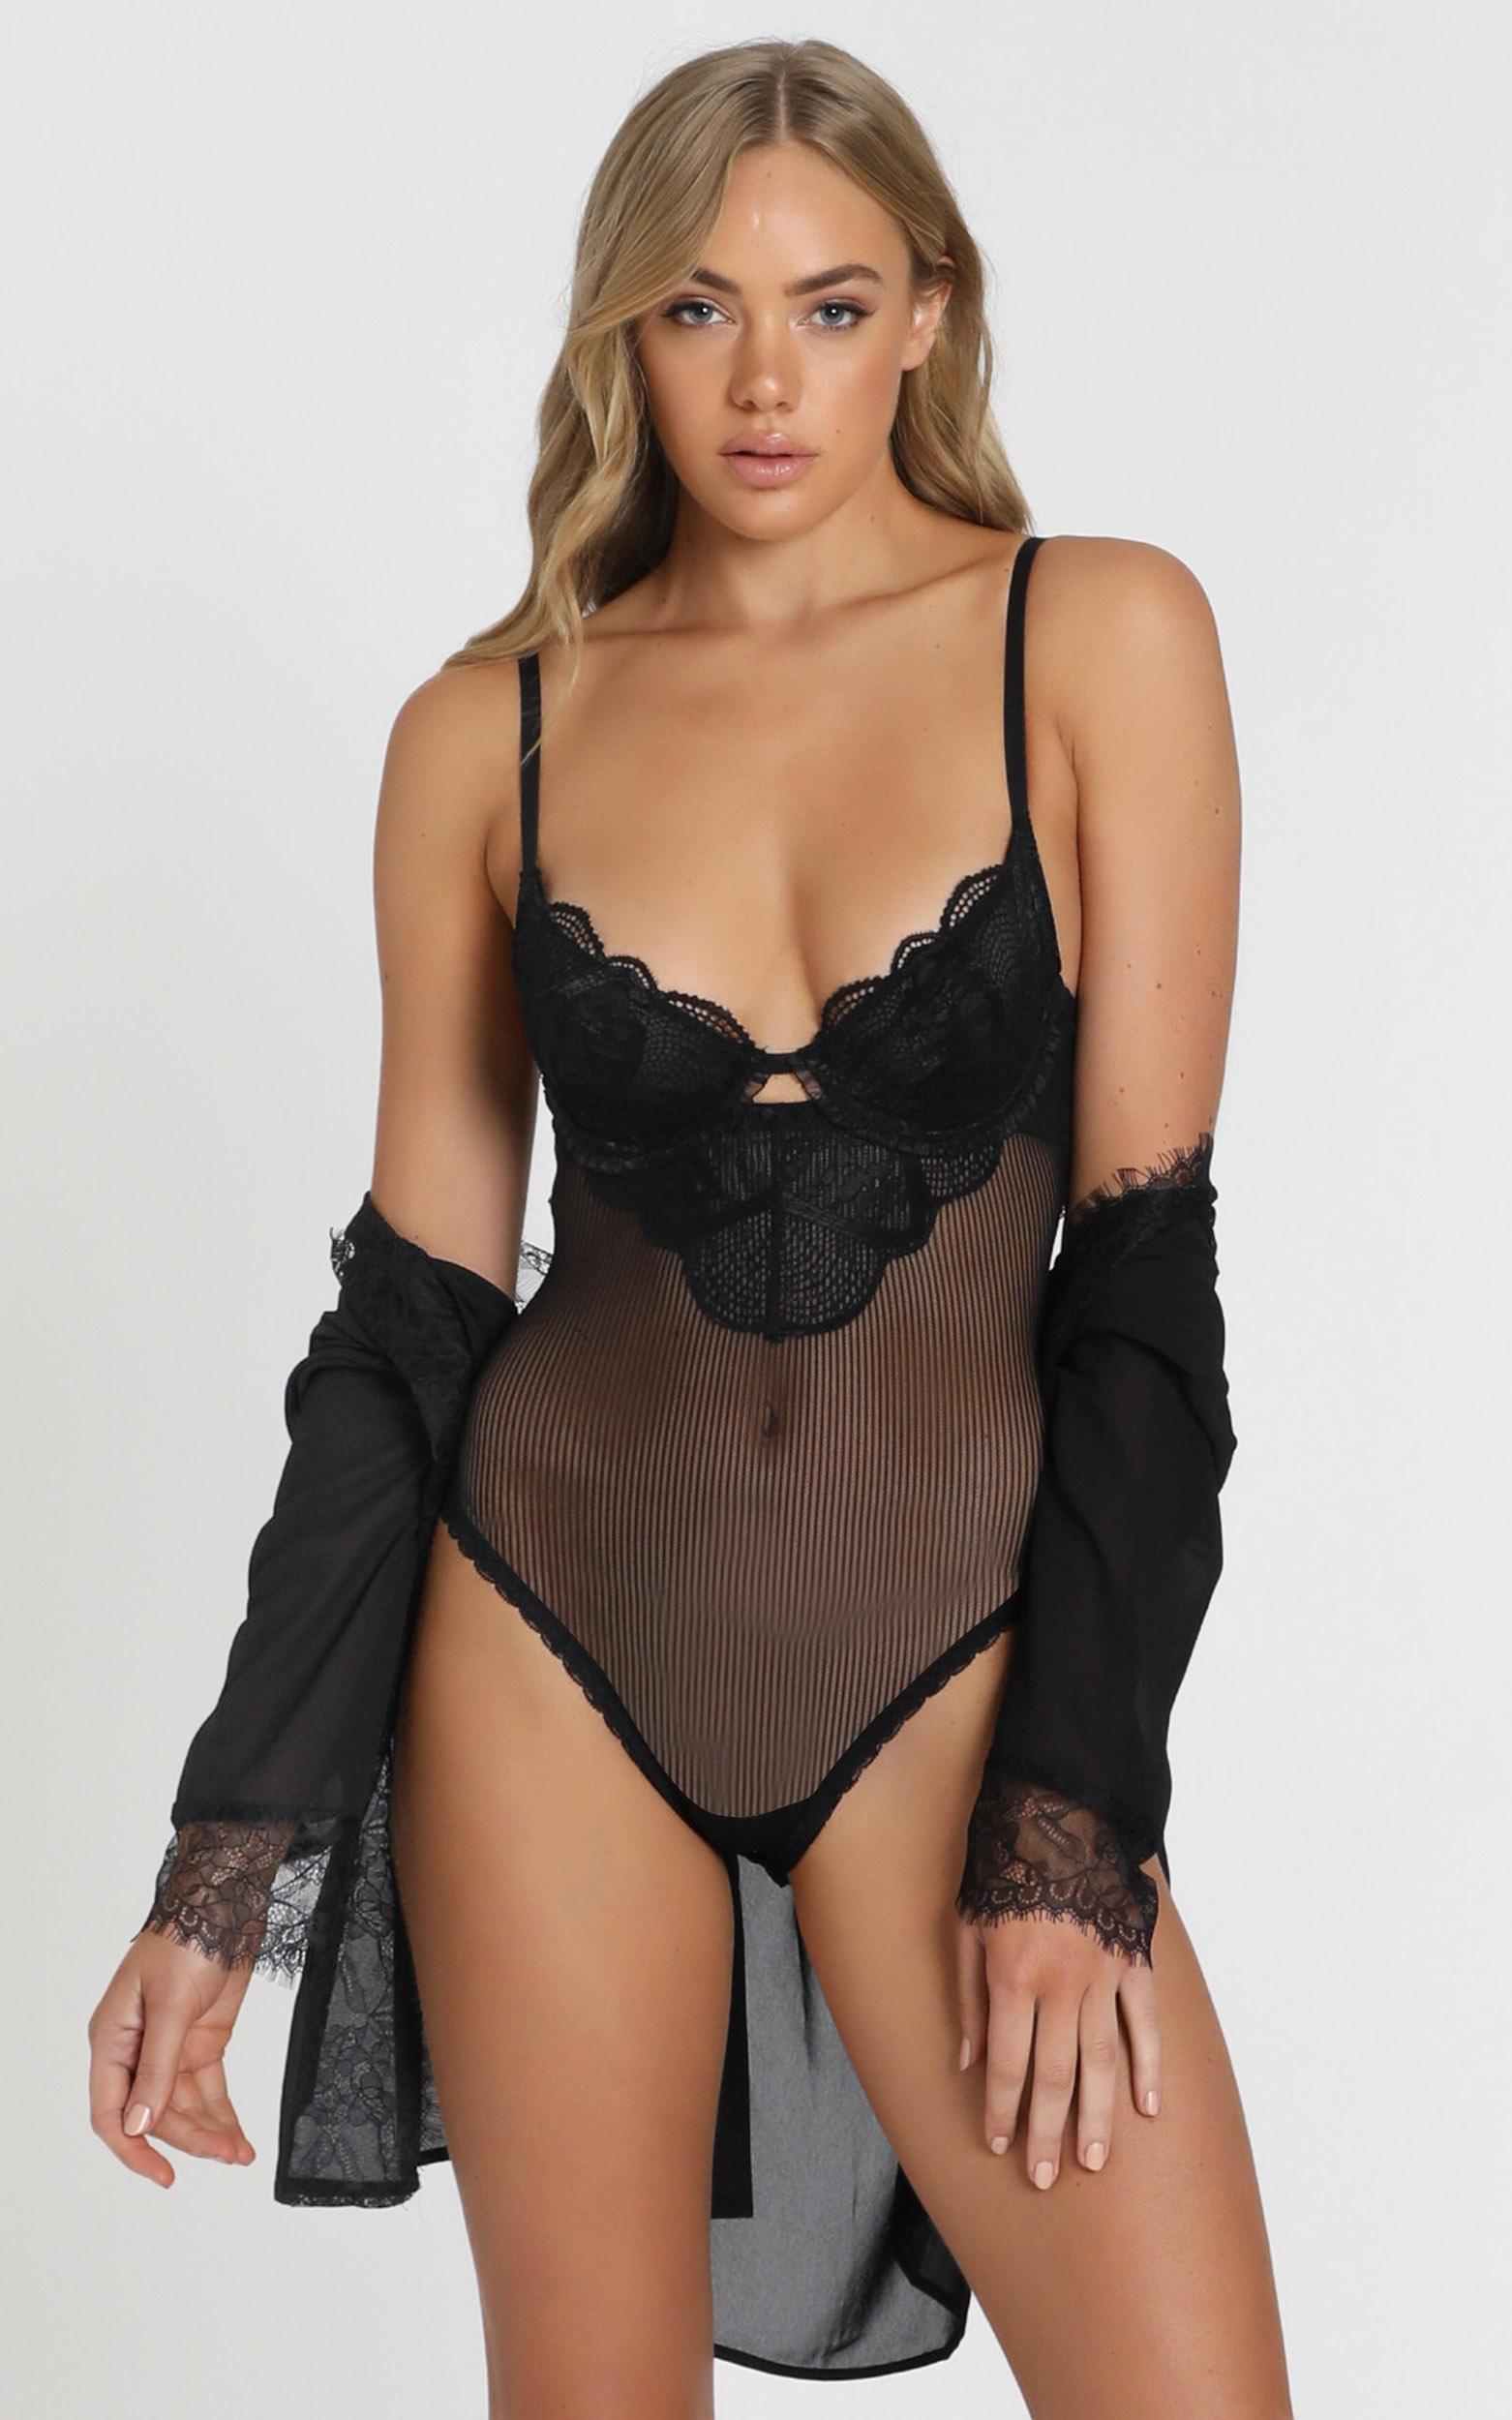 Kat The Label Zephyr Lace Bodysuit  - XS, Black, hi-res image number null